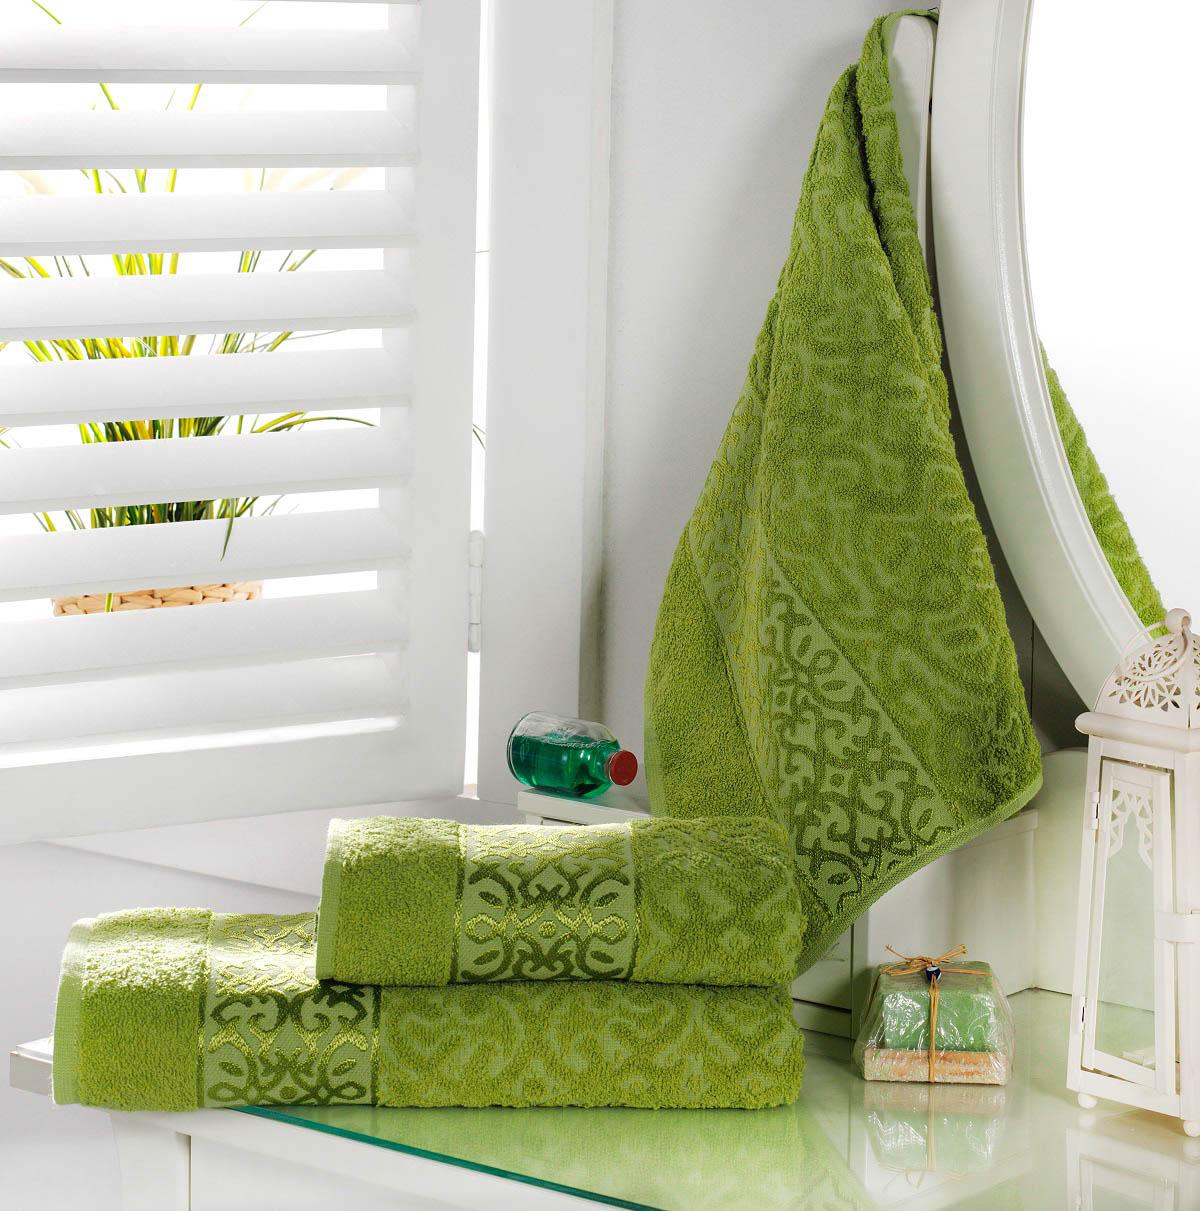 Полотенца Karna Полотенце Sahra Цвет: Зеленый (70х140 см) karna karna полотенце innes цвет красный 70х140 см